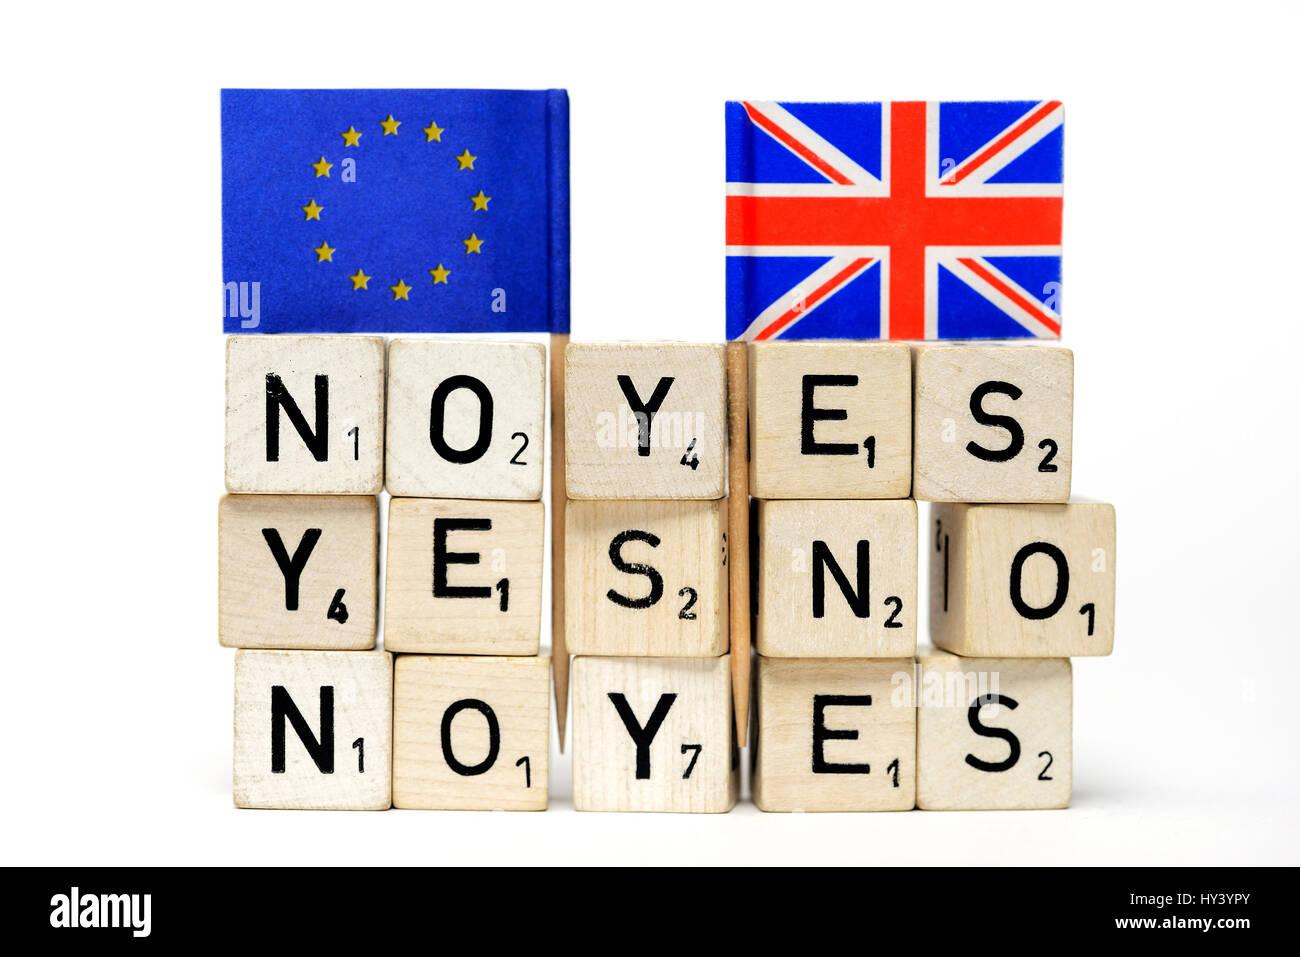 Flag of the EU and Great Britain, symbolic photo EU referendum, Fahne von EU und Gro?britannien, Symbolfoto EU-Referendum - Stock Image